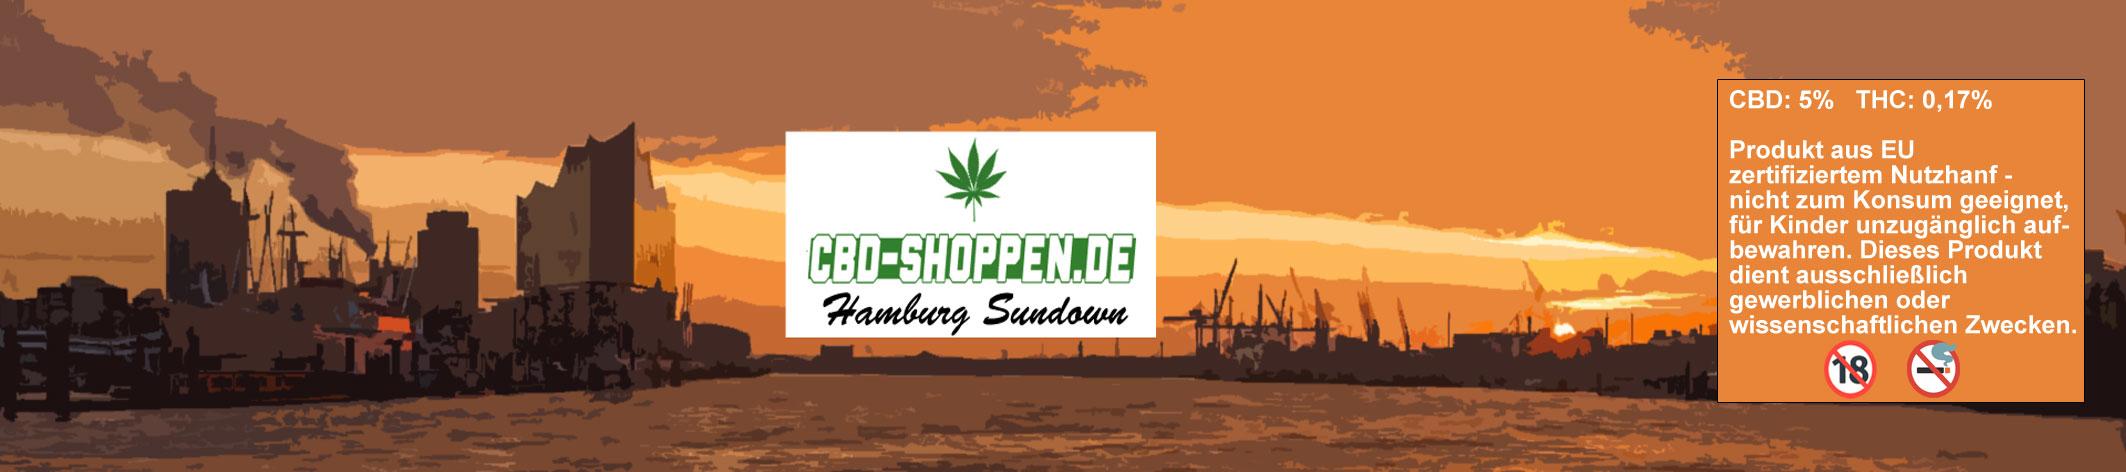 Hamburg Sundown CBD